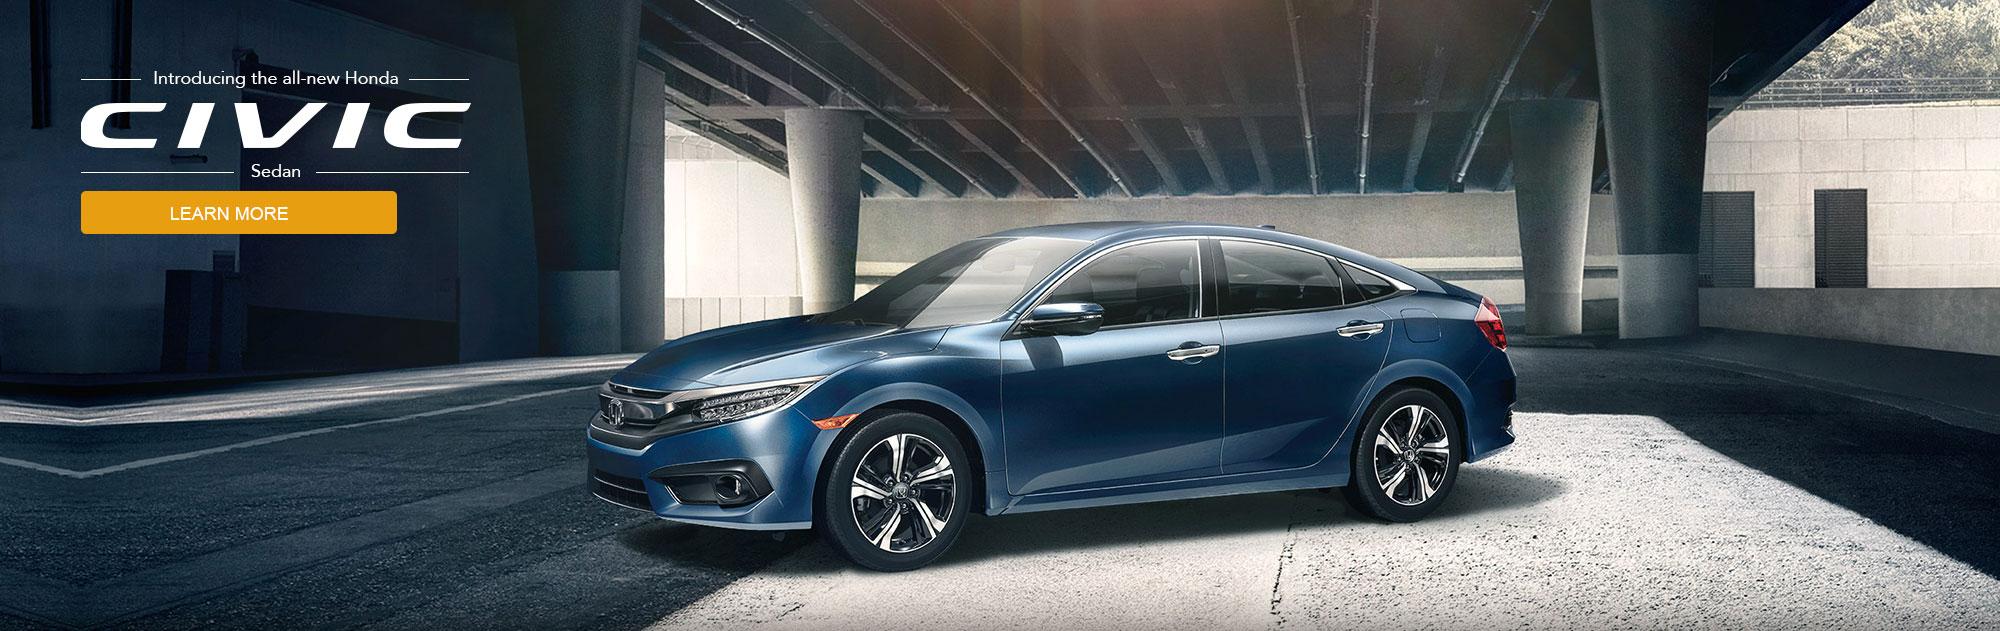 2016 Civic & Honda Dealership in Dothan AL | Jim Skinner Honda markmcfarlin.com